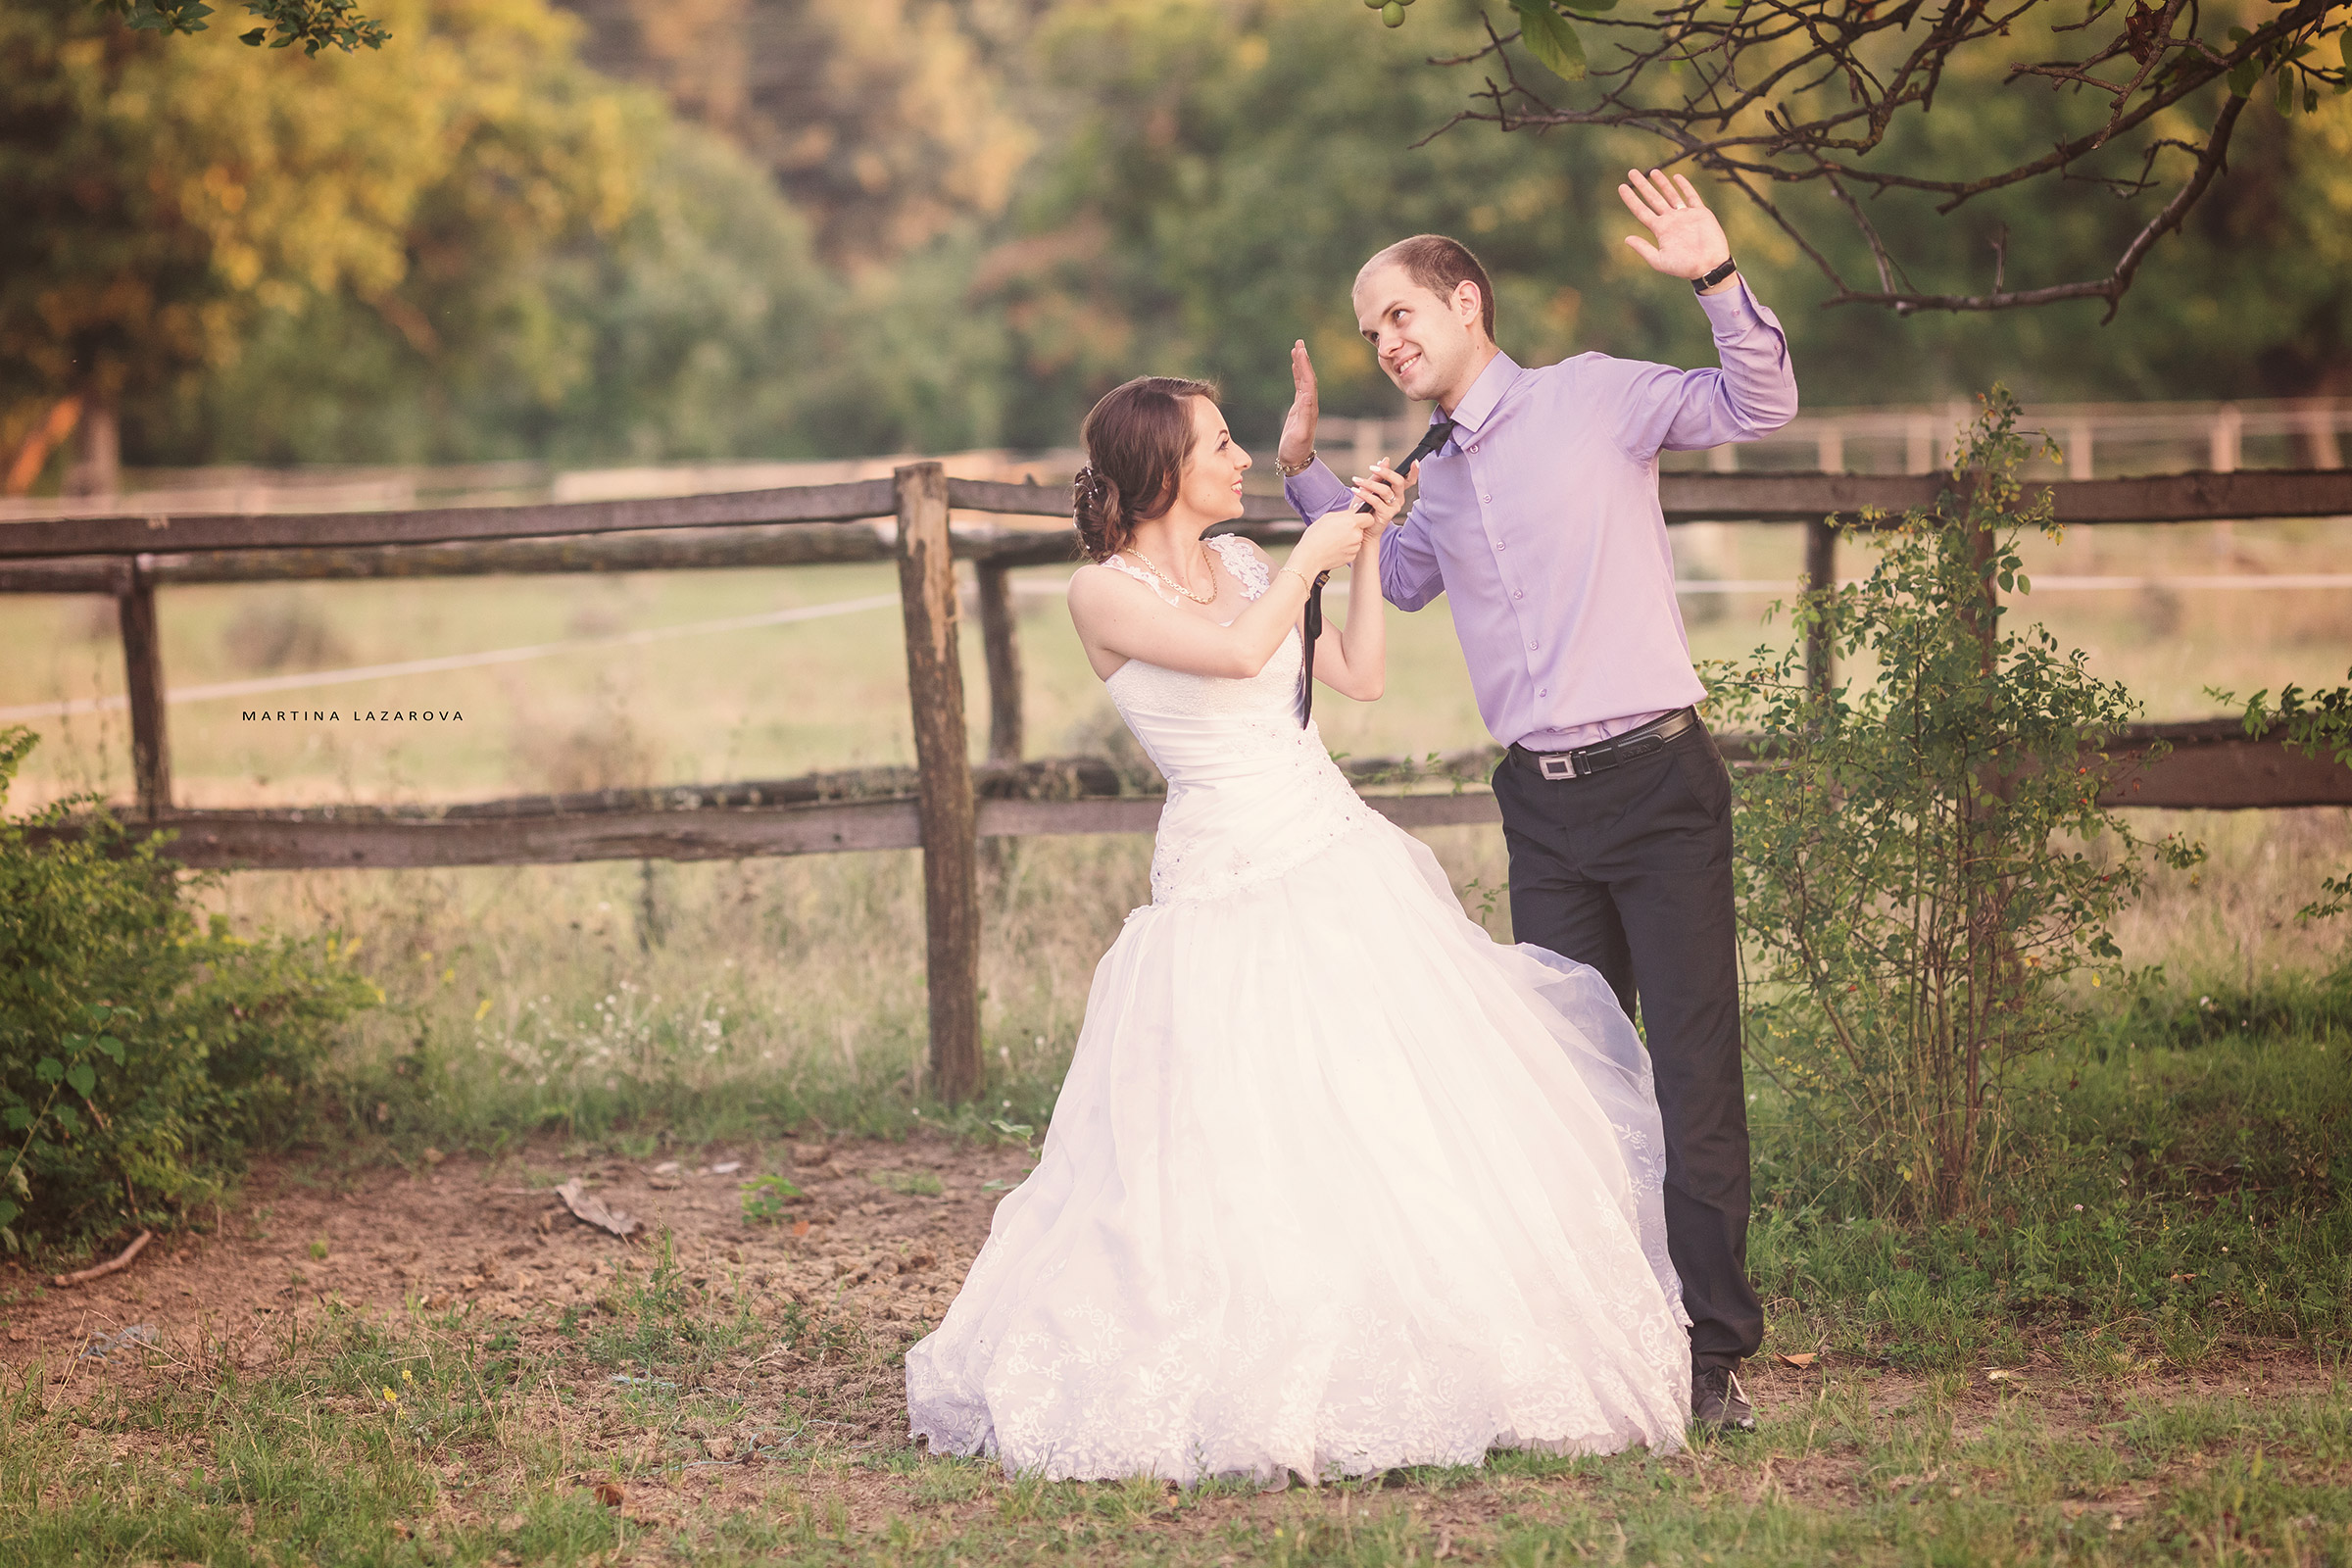 Wedding-PhotoShoot-A&S-76